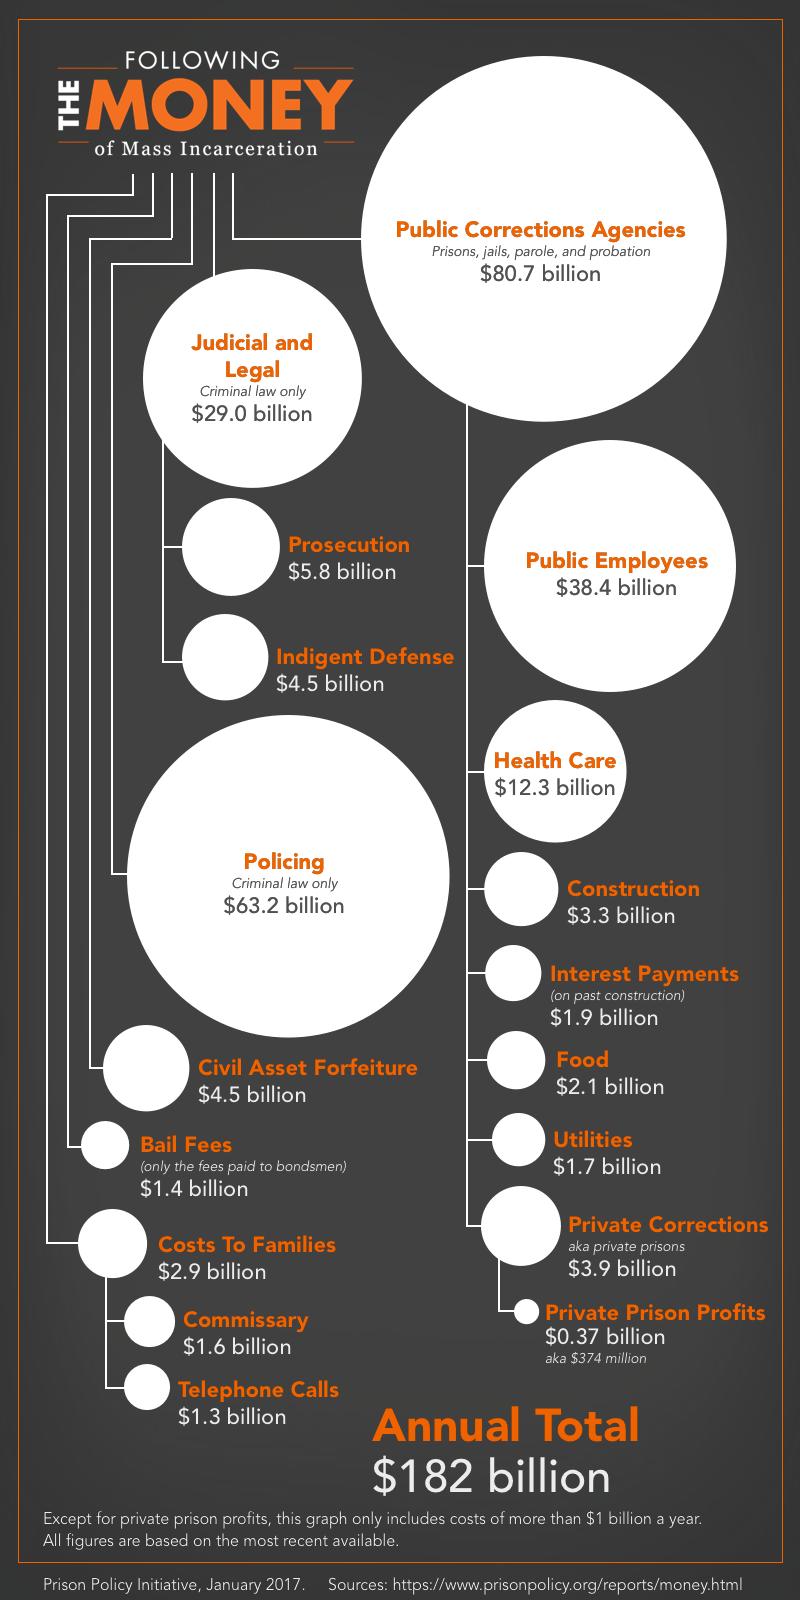 Mass Incarceration: Following the money